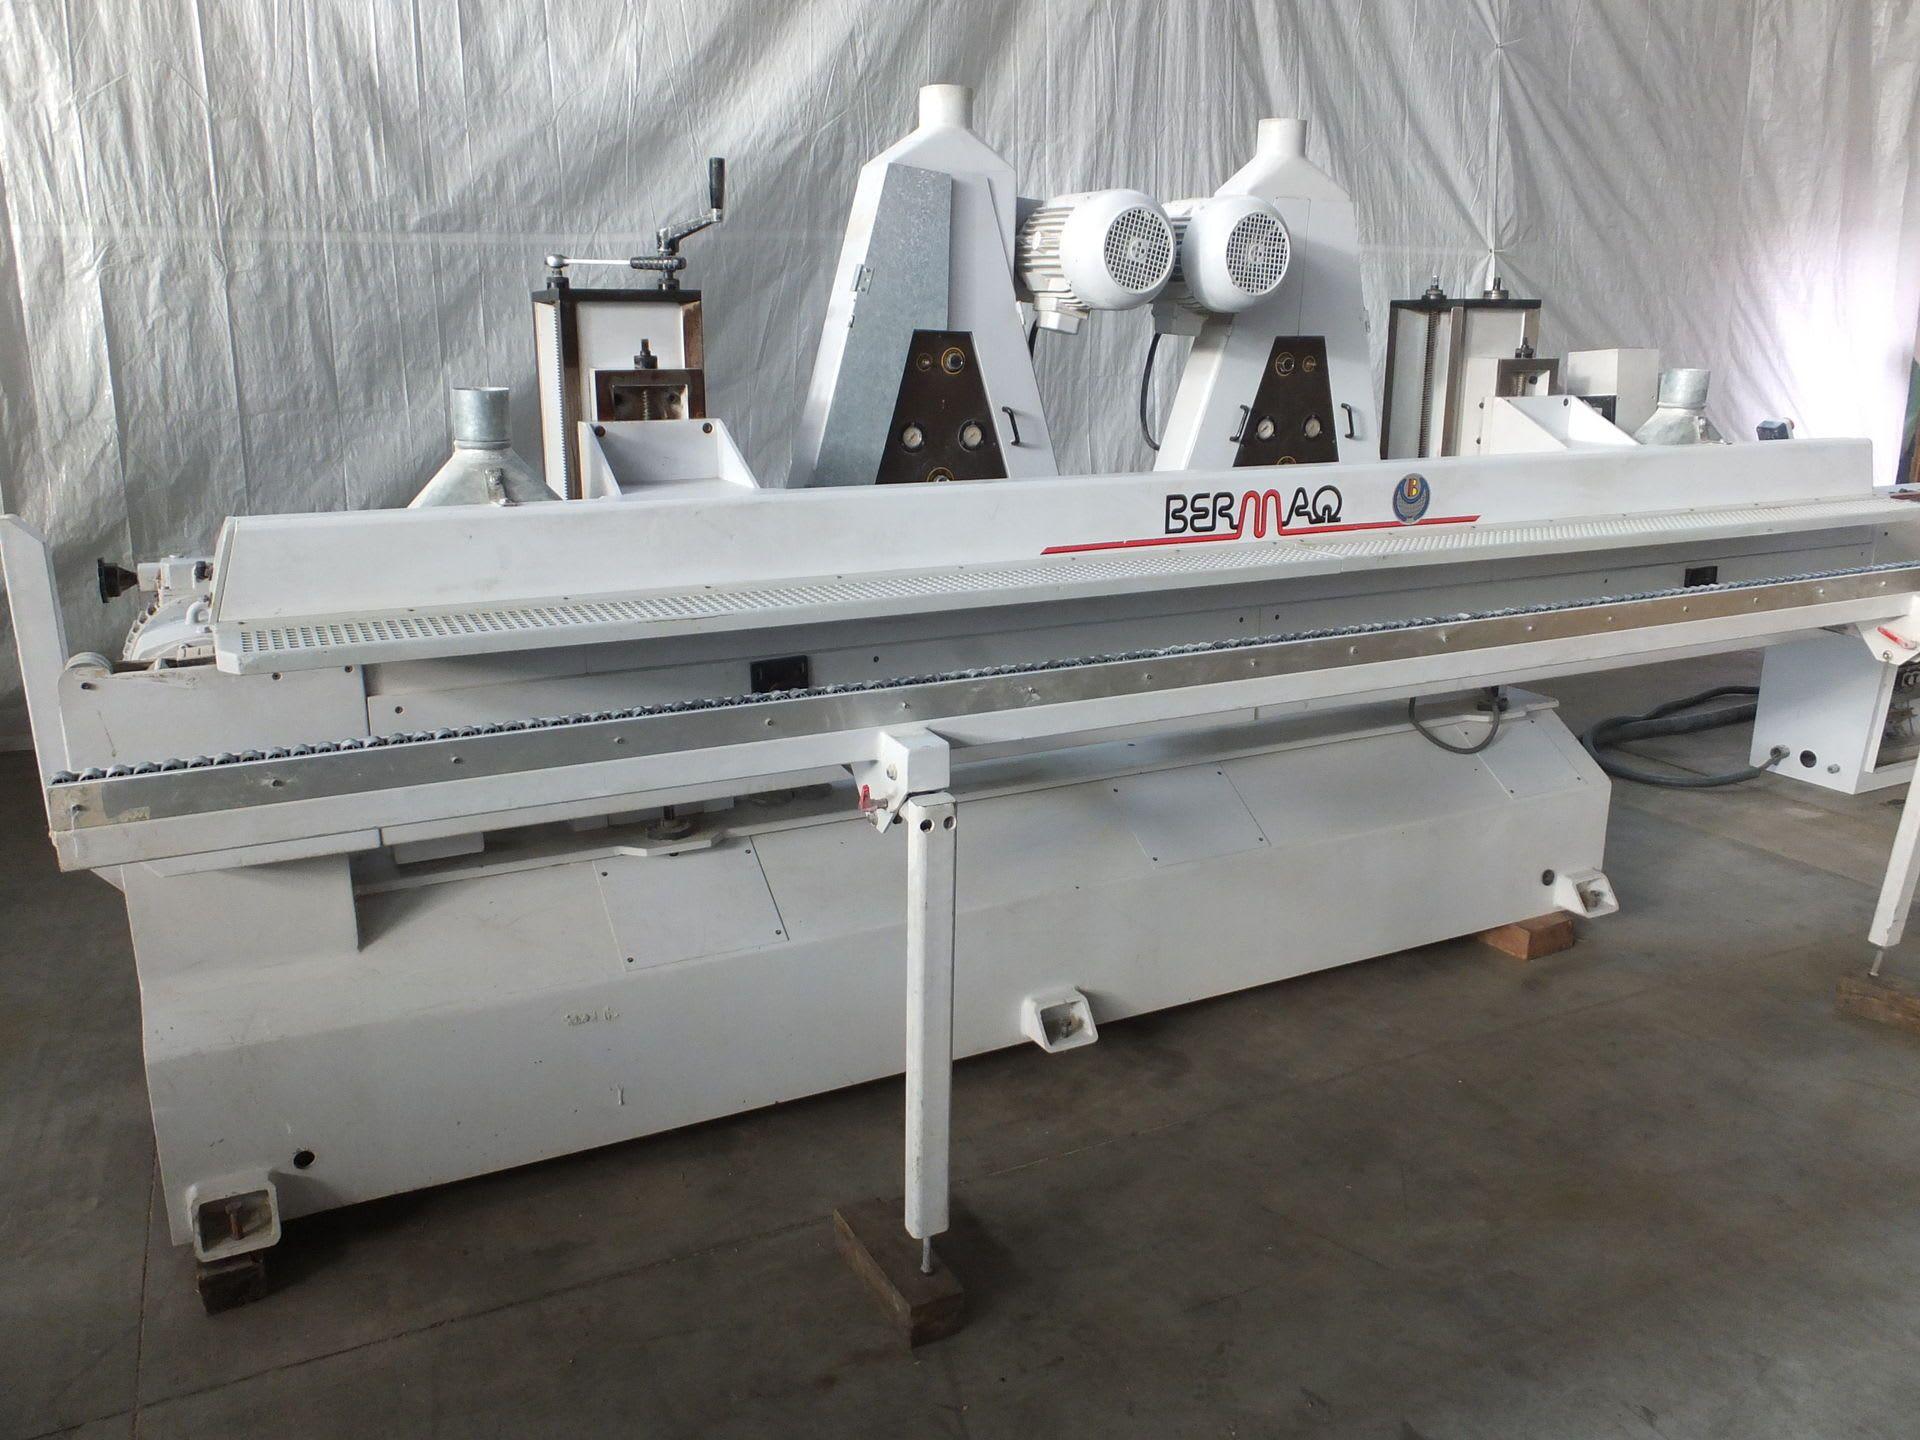 BERMAQ LC 2 Kantenschleifmaschine